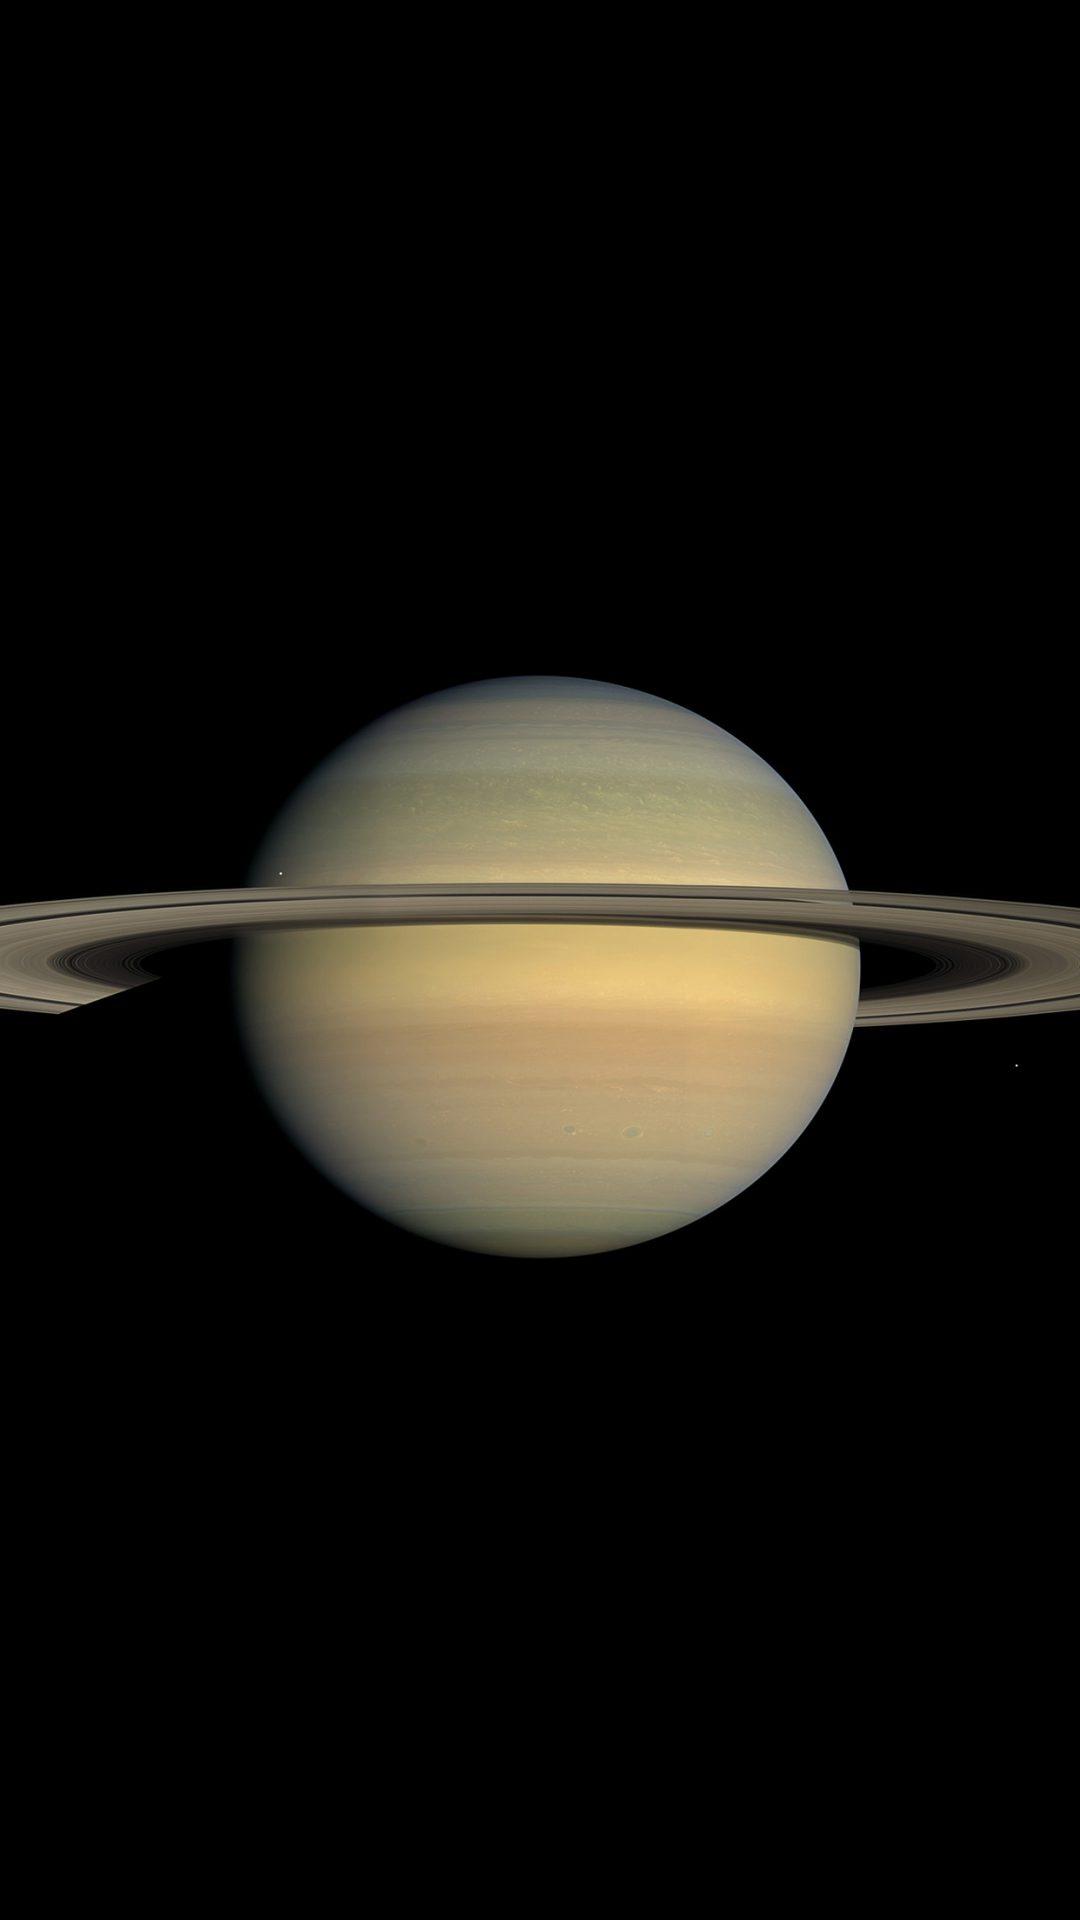 Saturn Space Star Nature Art Illustration